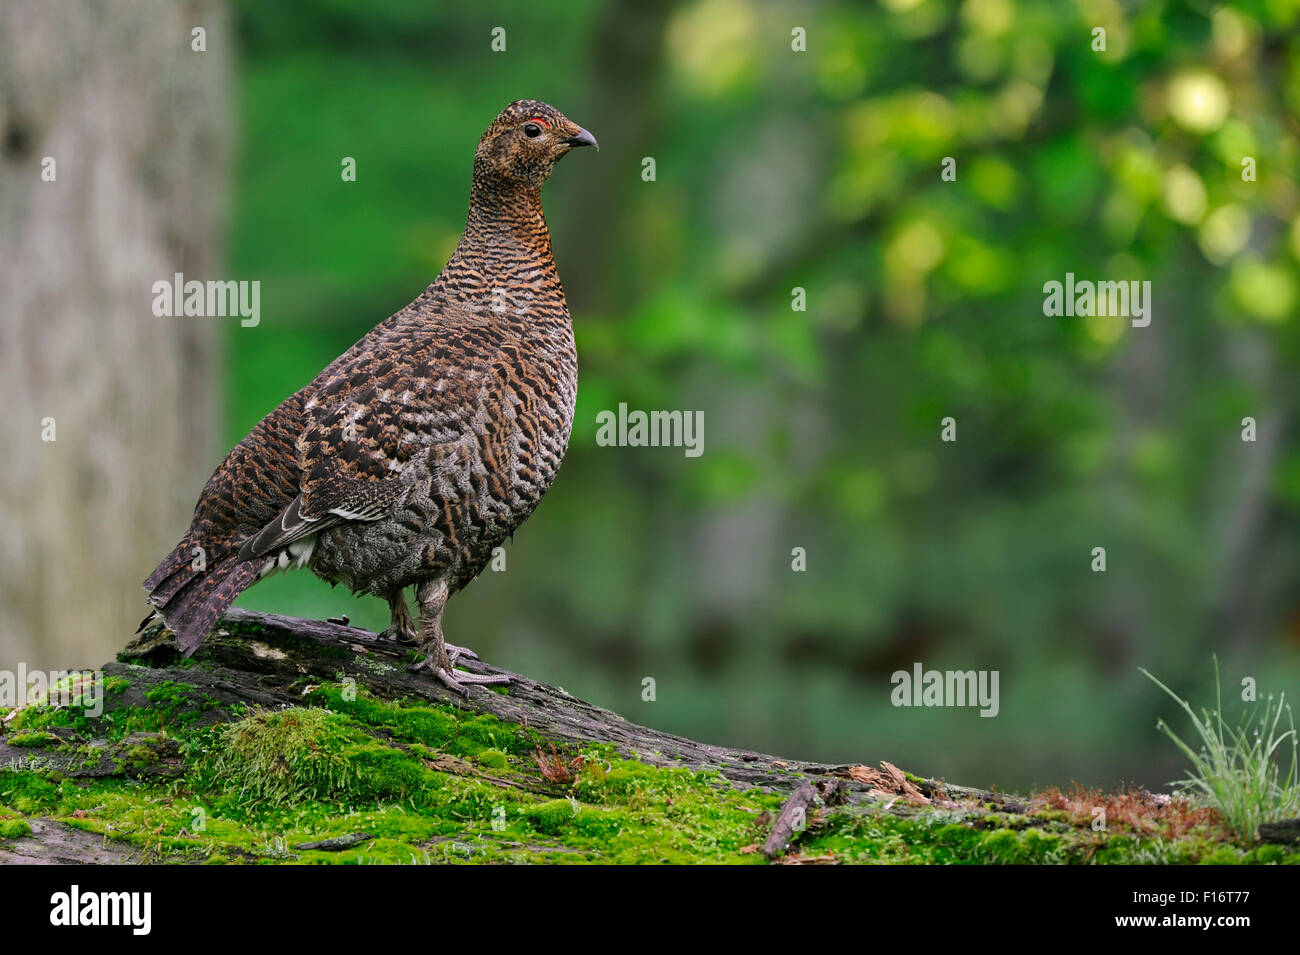 Black grouse / blackgame / blackcock (Lyrurus tetrix / Tetrao tetrix) female on fallen log in forest - Stock Image